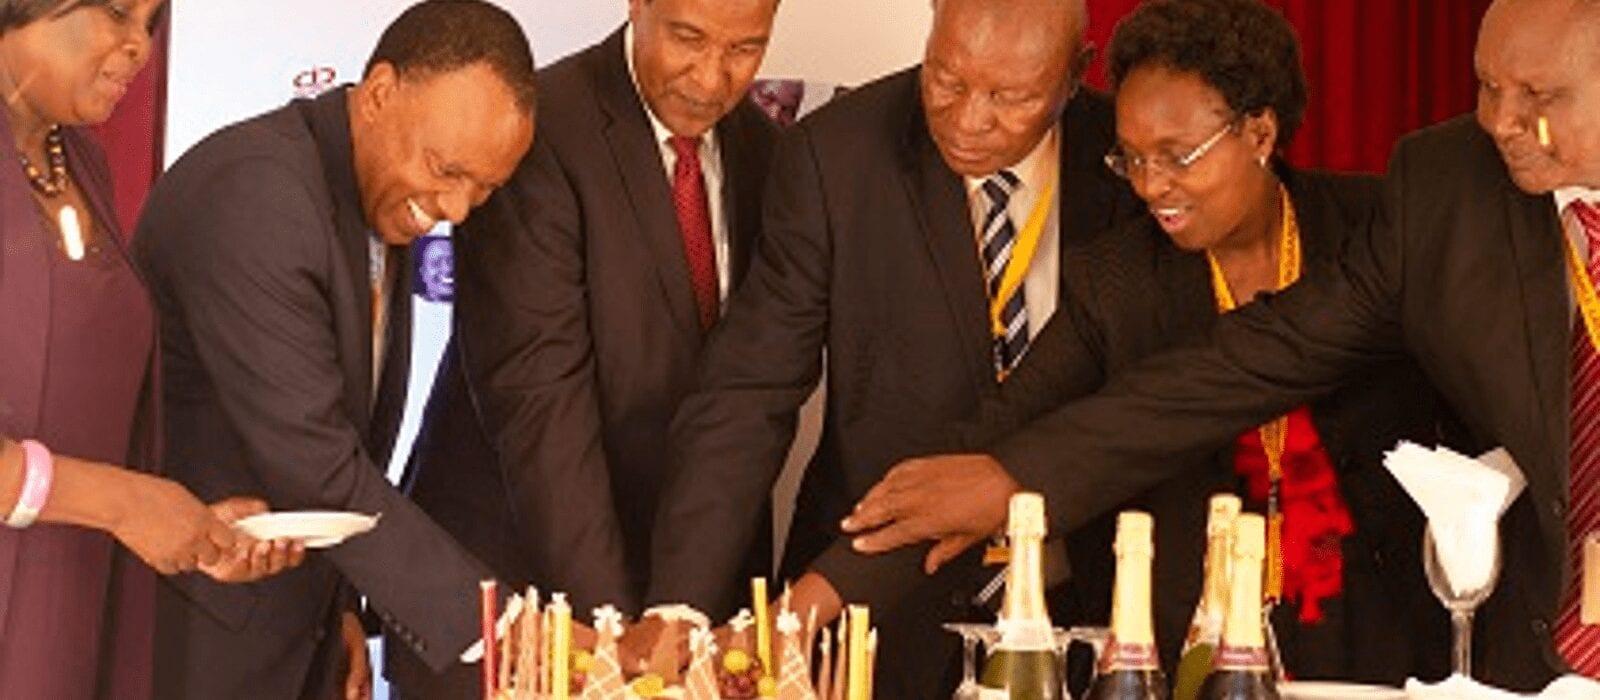 CIC Insurance Group Bounces from Ksh287 Million Loss to 337 Million Profit Rise Ksh337 Million